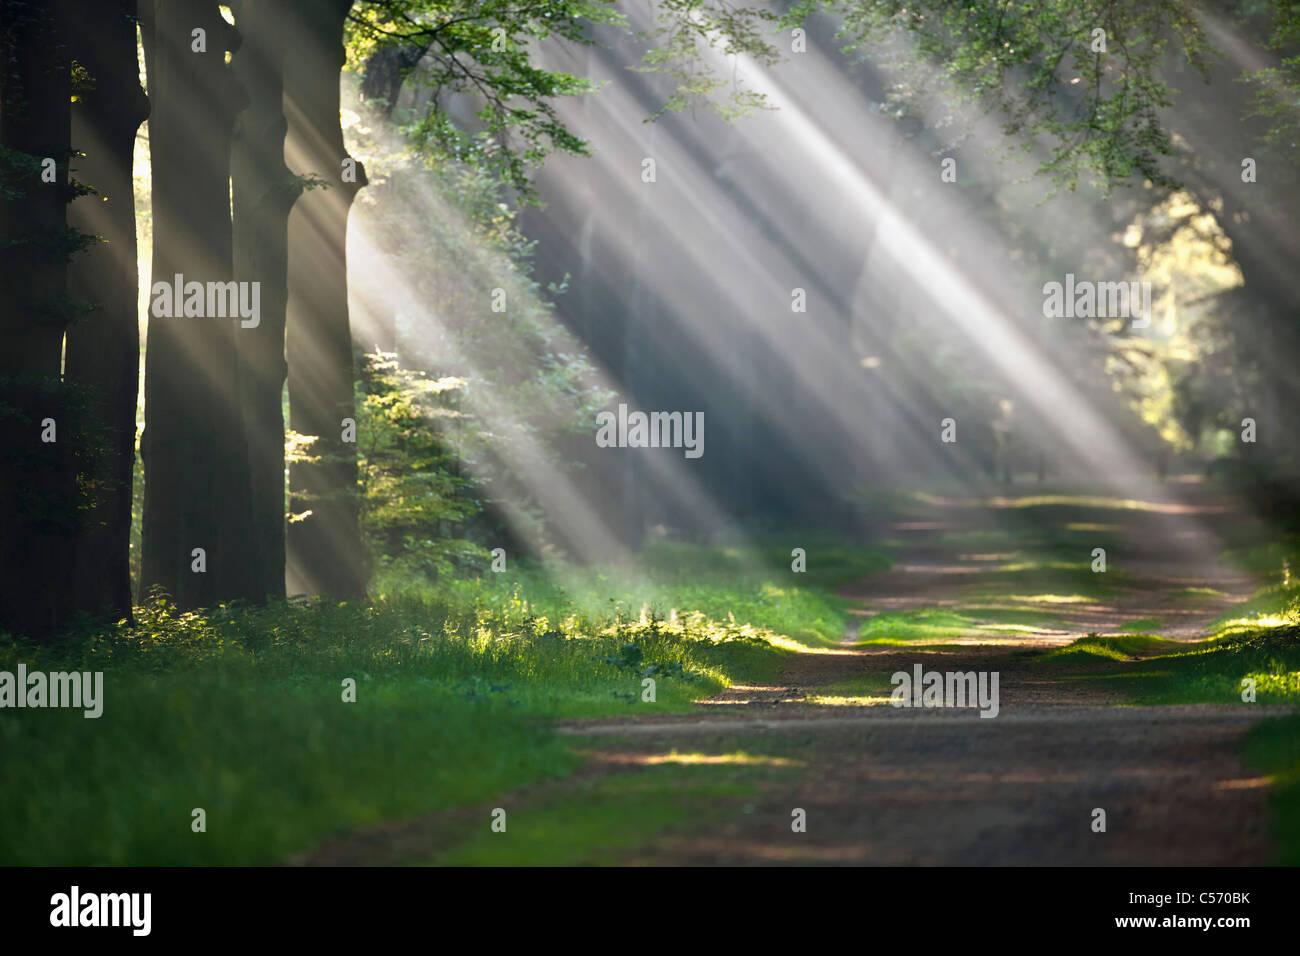 The Netherlands, 's-Graveland, Beech forest road. Rural estate called Gooilust. Sunrays in morning mist. - Stock Image